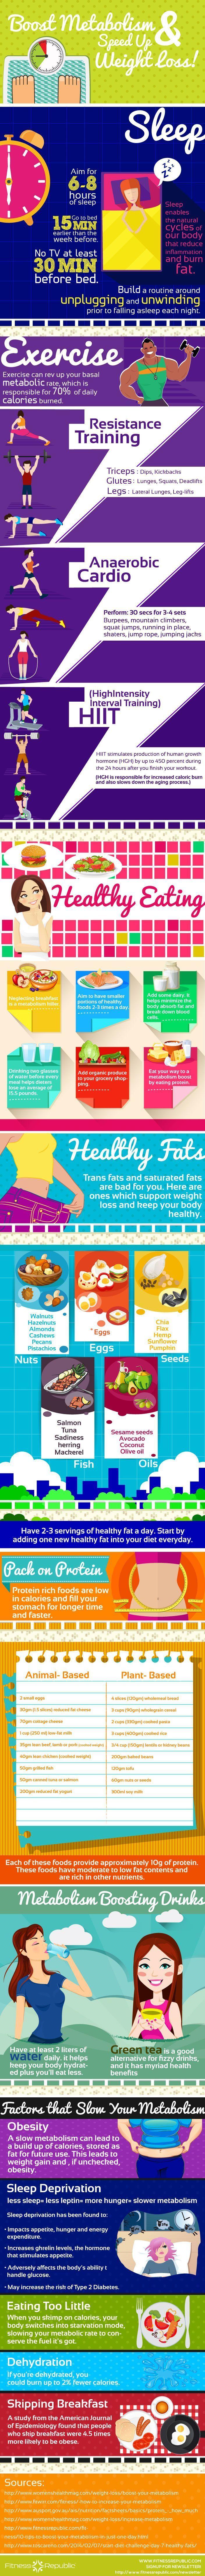 Reduce abdominal fat ayurveda picture 2